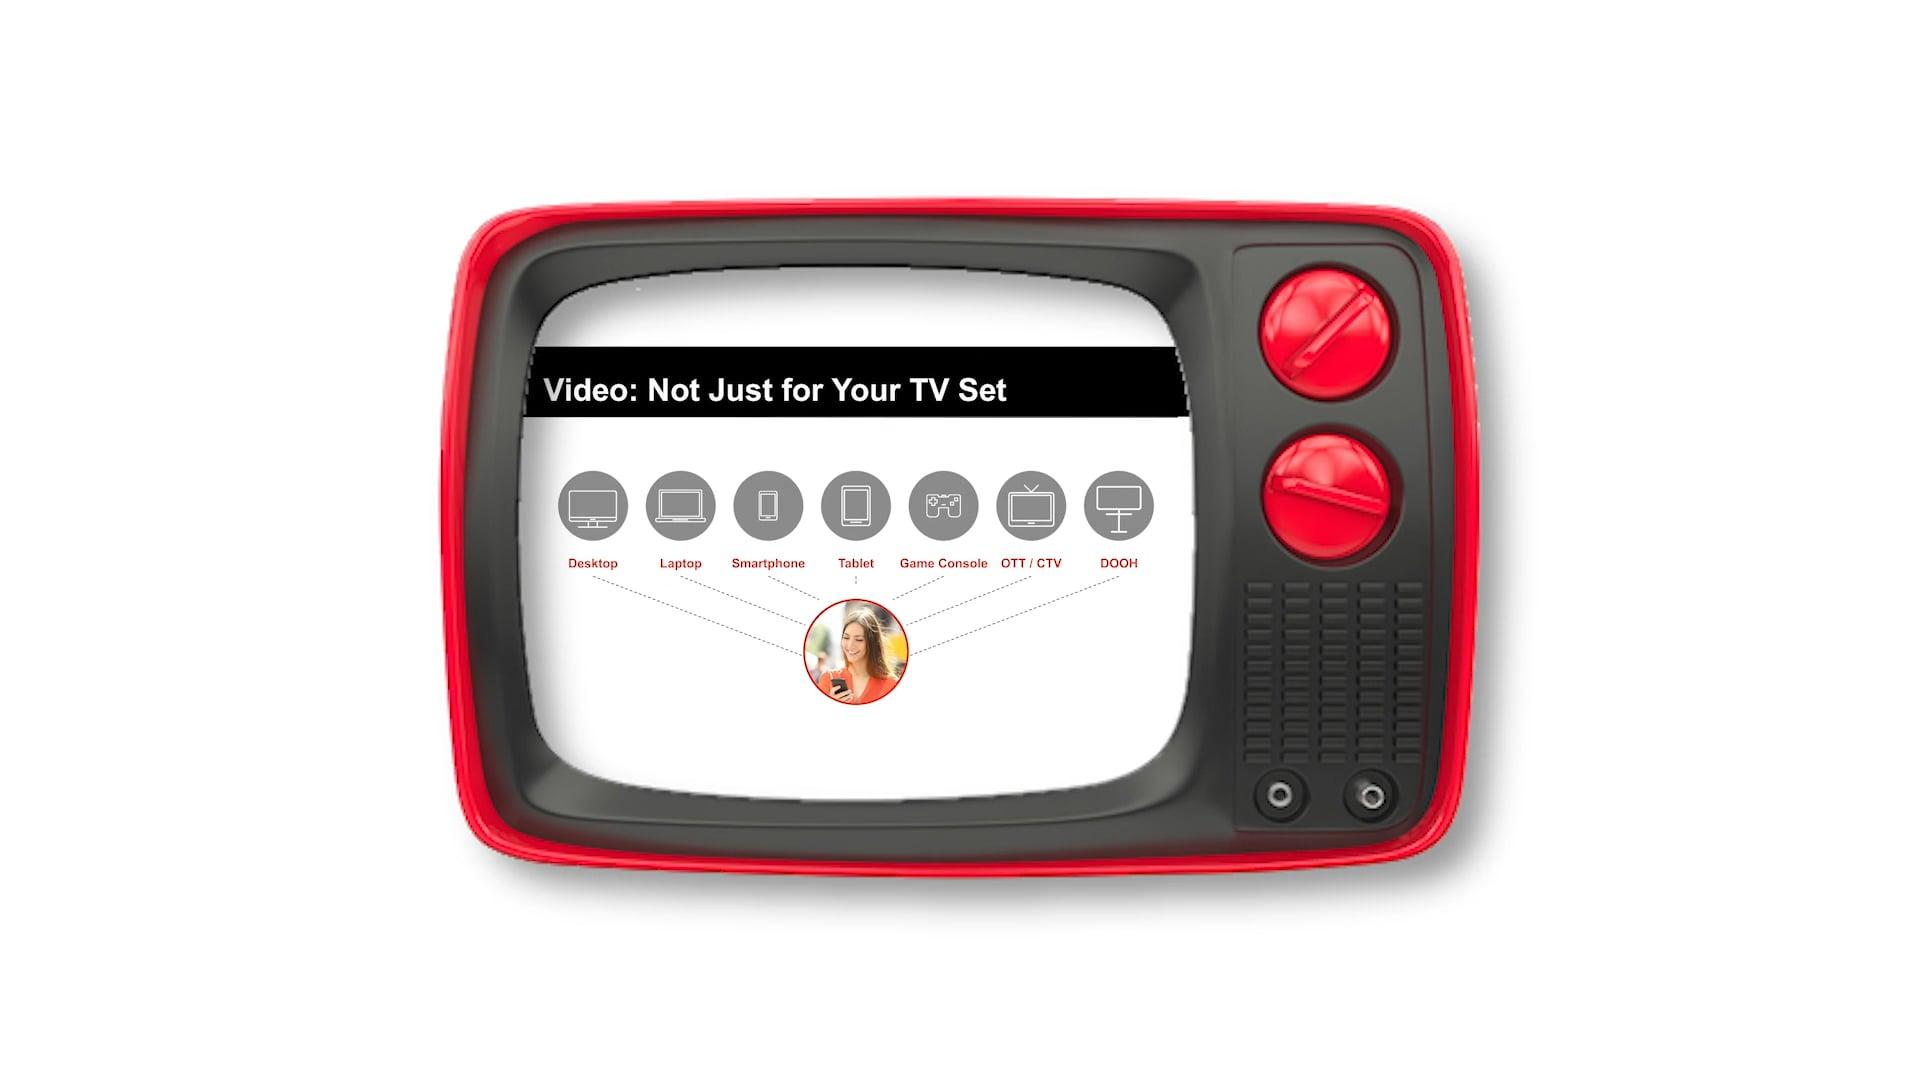 01 - IAB_CrossPlatform_Course Introduction_Cross-Platform Video Advertising_FINAL